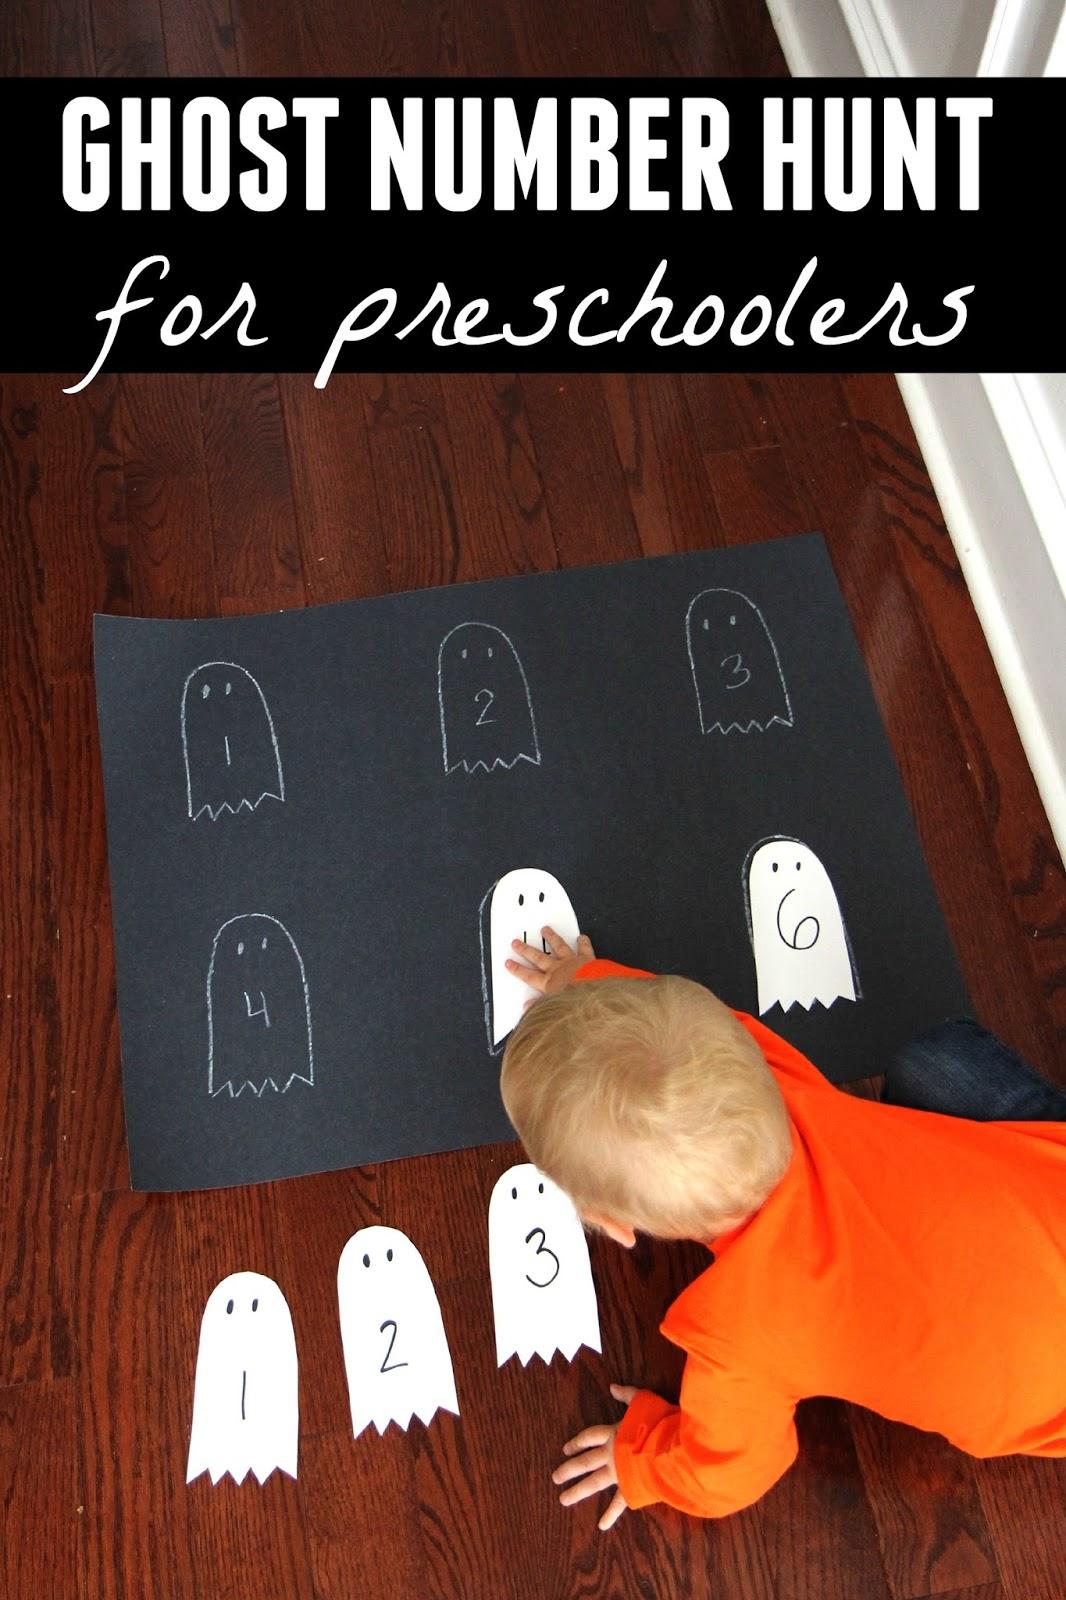 Toddler Approved Ghost Number Hunt For Preschoolers